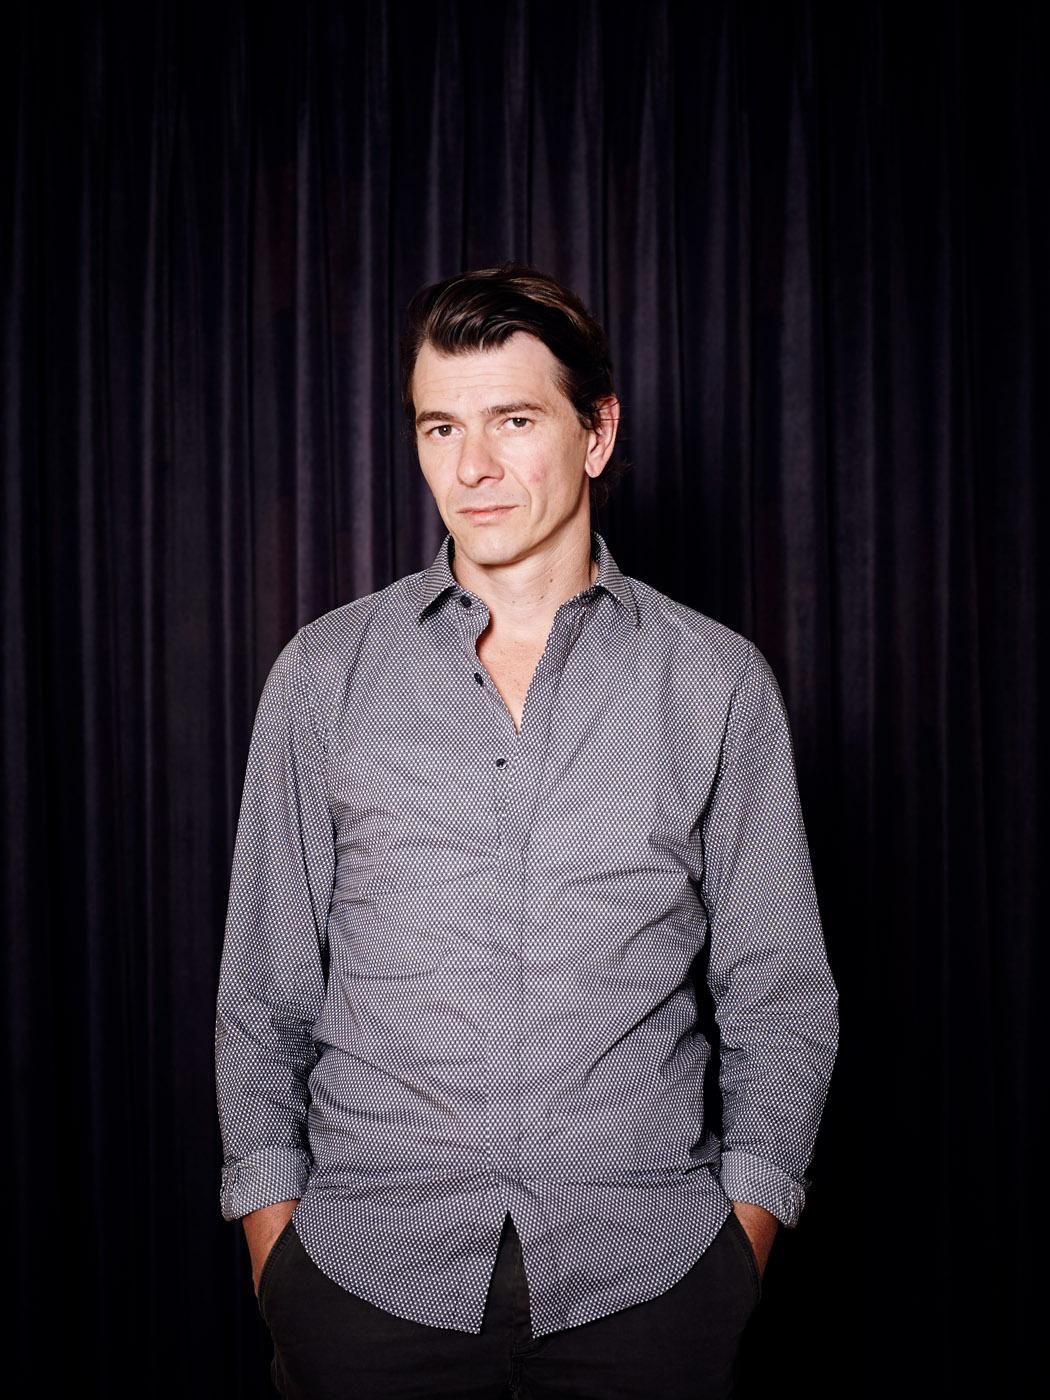 Nederland, Amsterdam, 02-09-2014 Dimitri Verhulst, Belgisch schrijver en dichter. PHOTO AND COPYRIGHT ROGER CREMERS